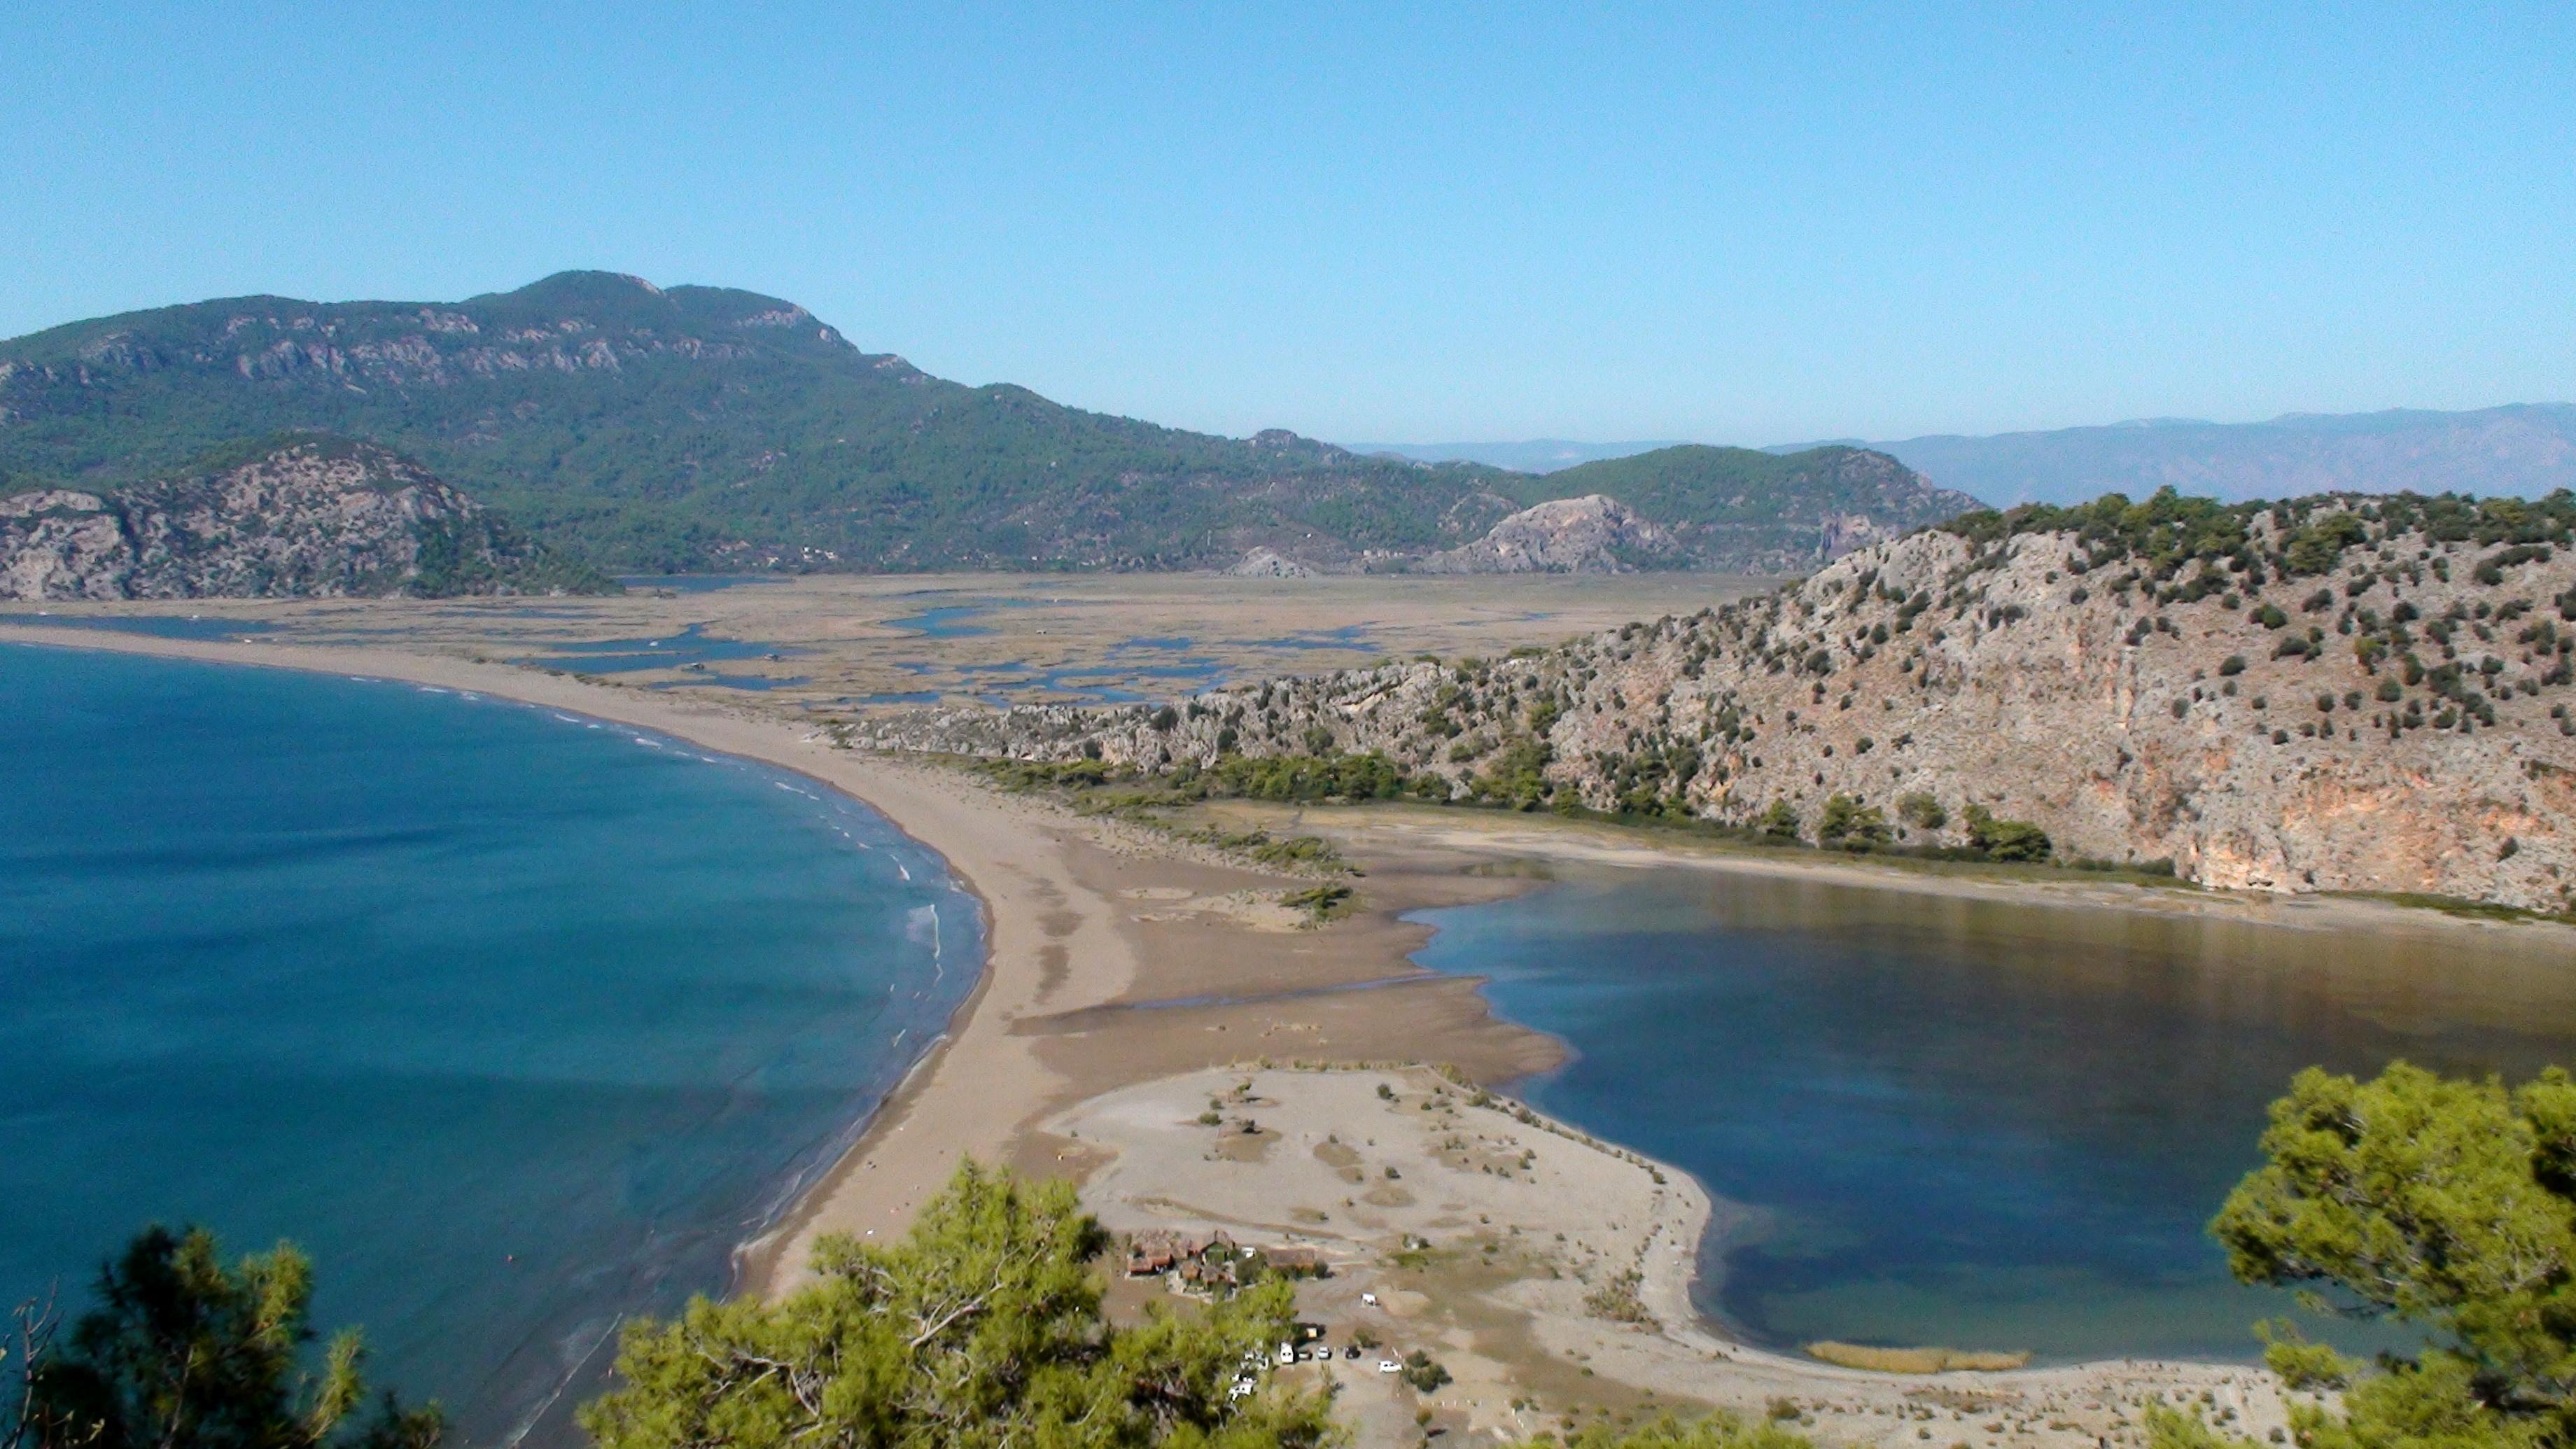 File:Iztuzu strand.JPG - Wikimedia Commons